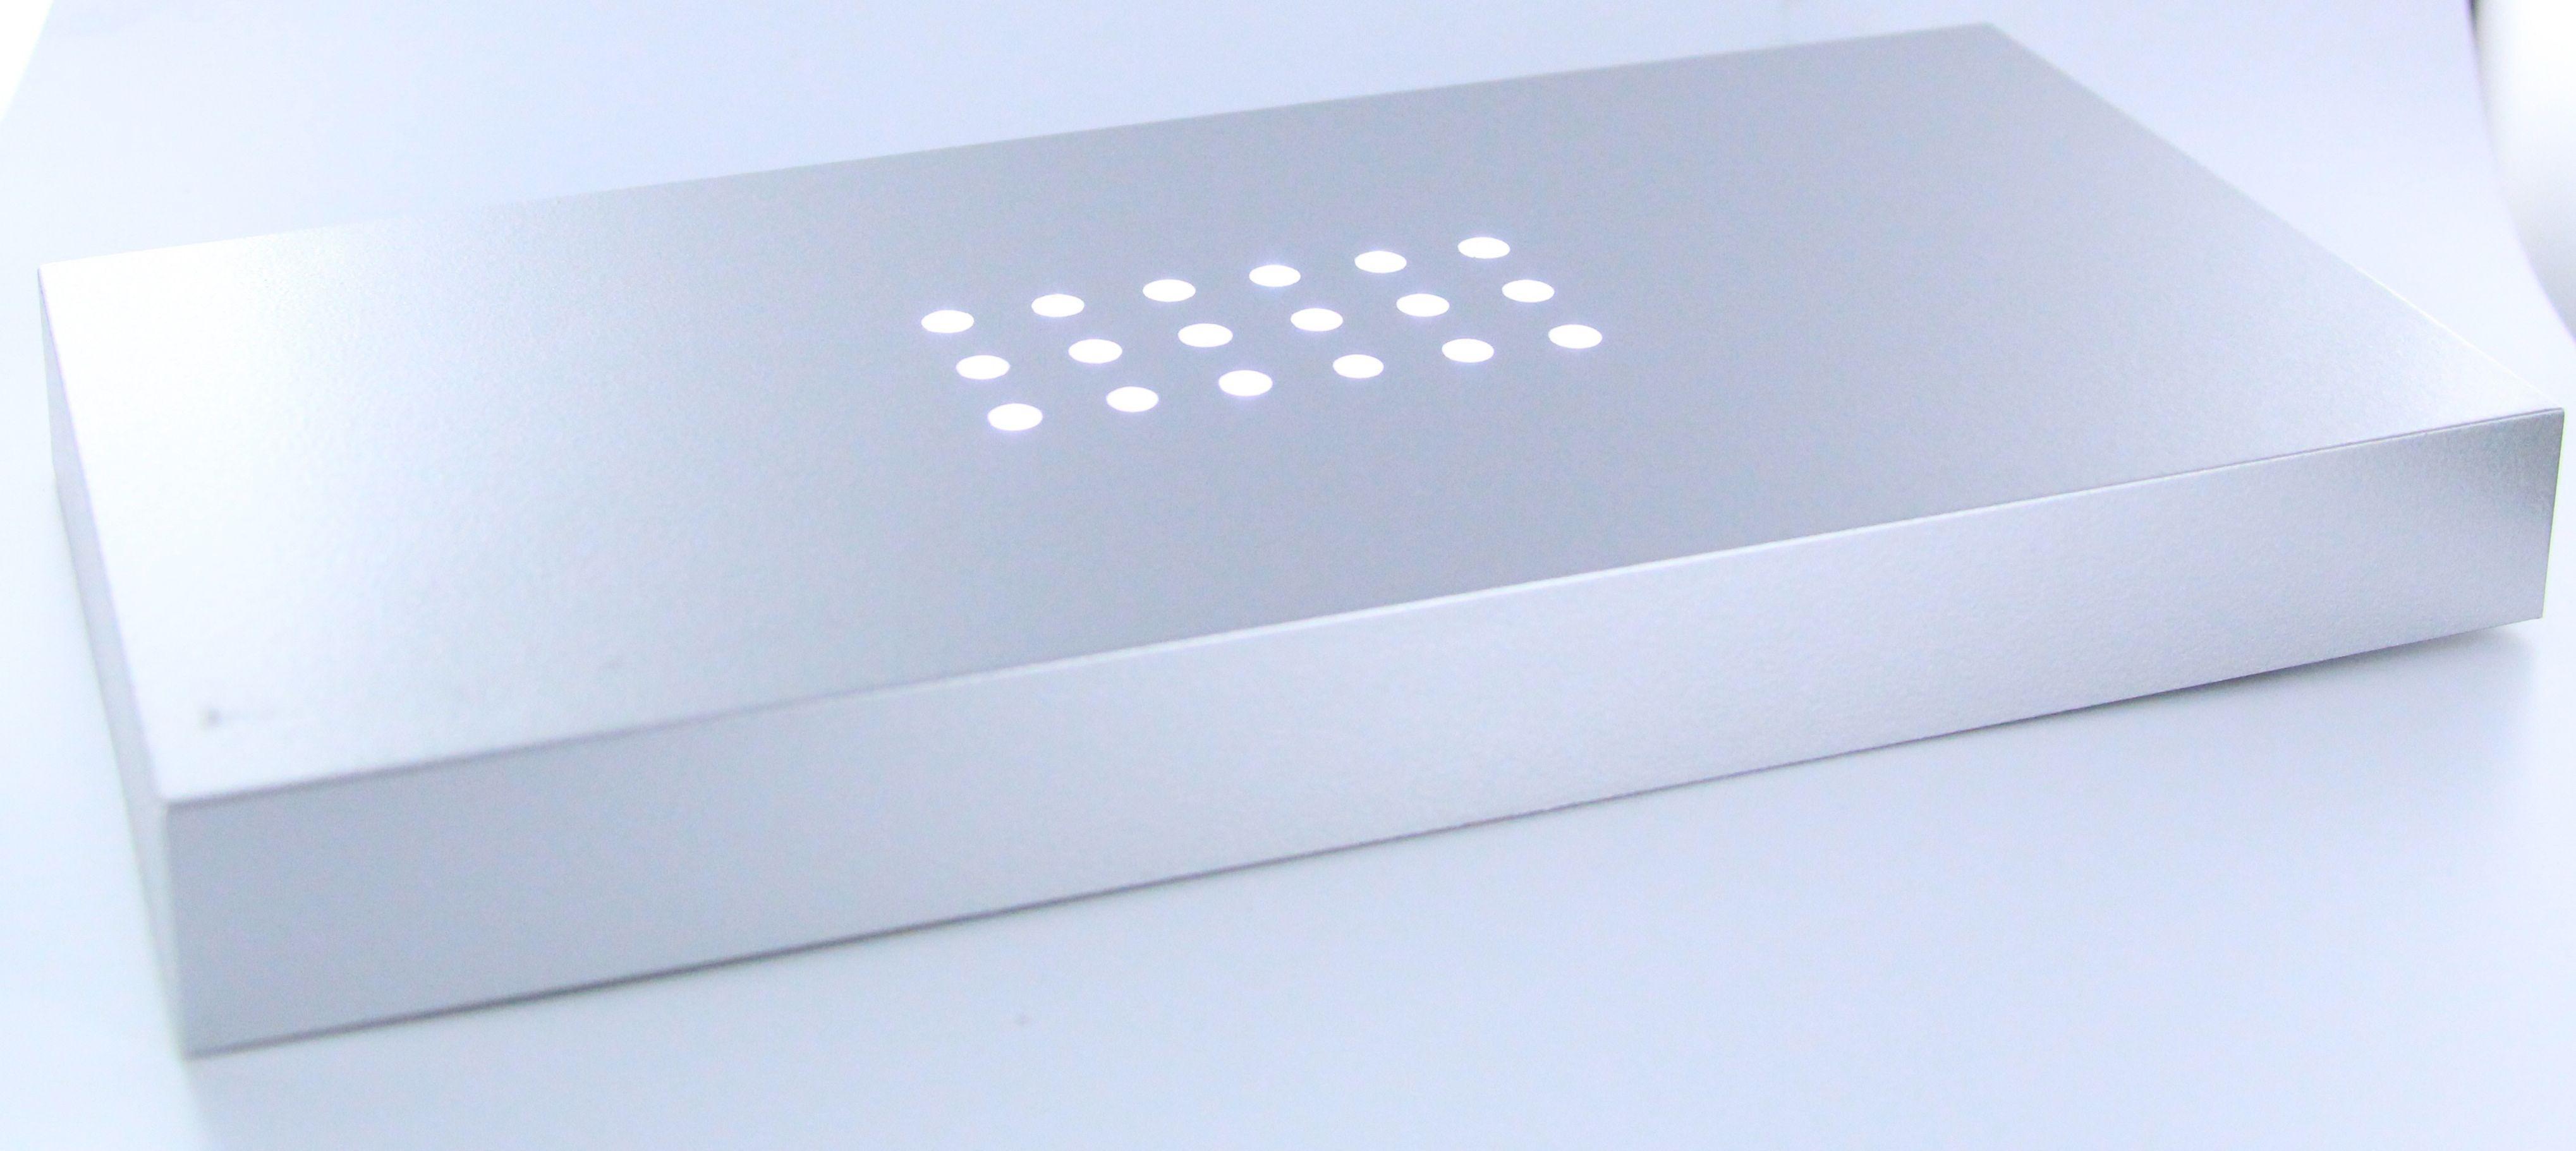 LED LEUCHTSOCKEL   18 weiße LED   200x100x20mm   Farbe Silber